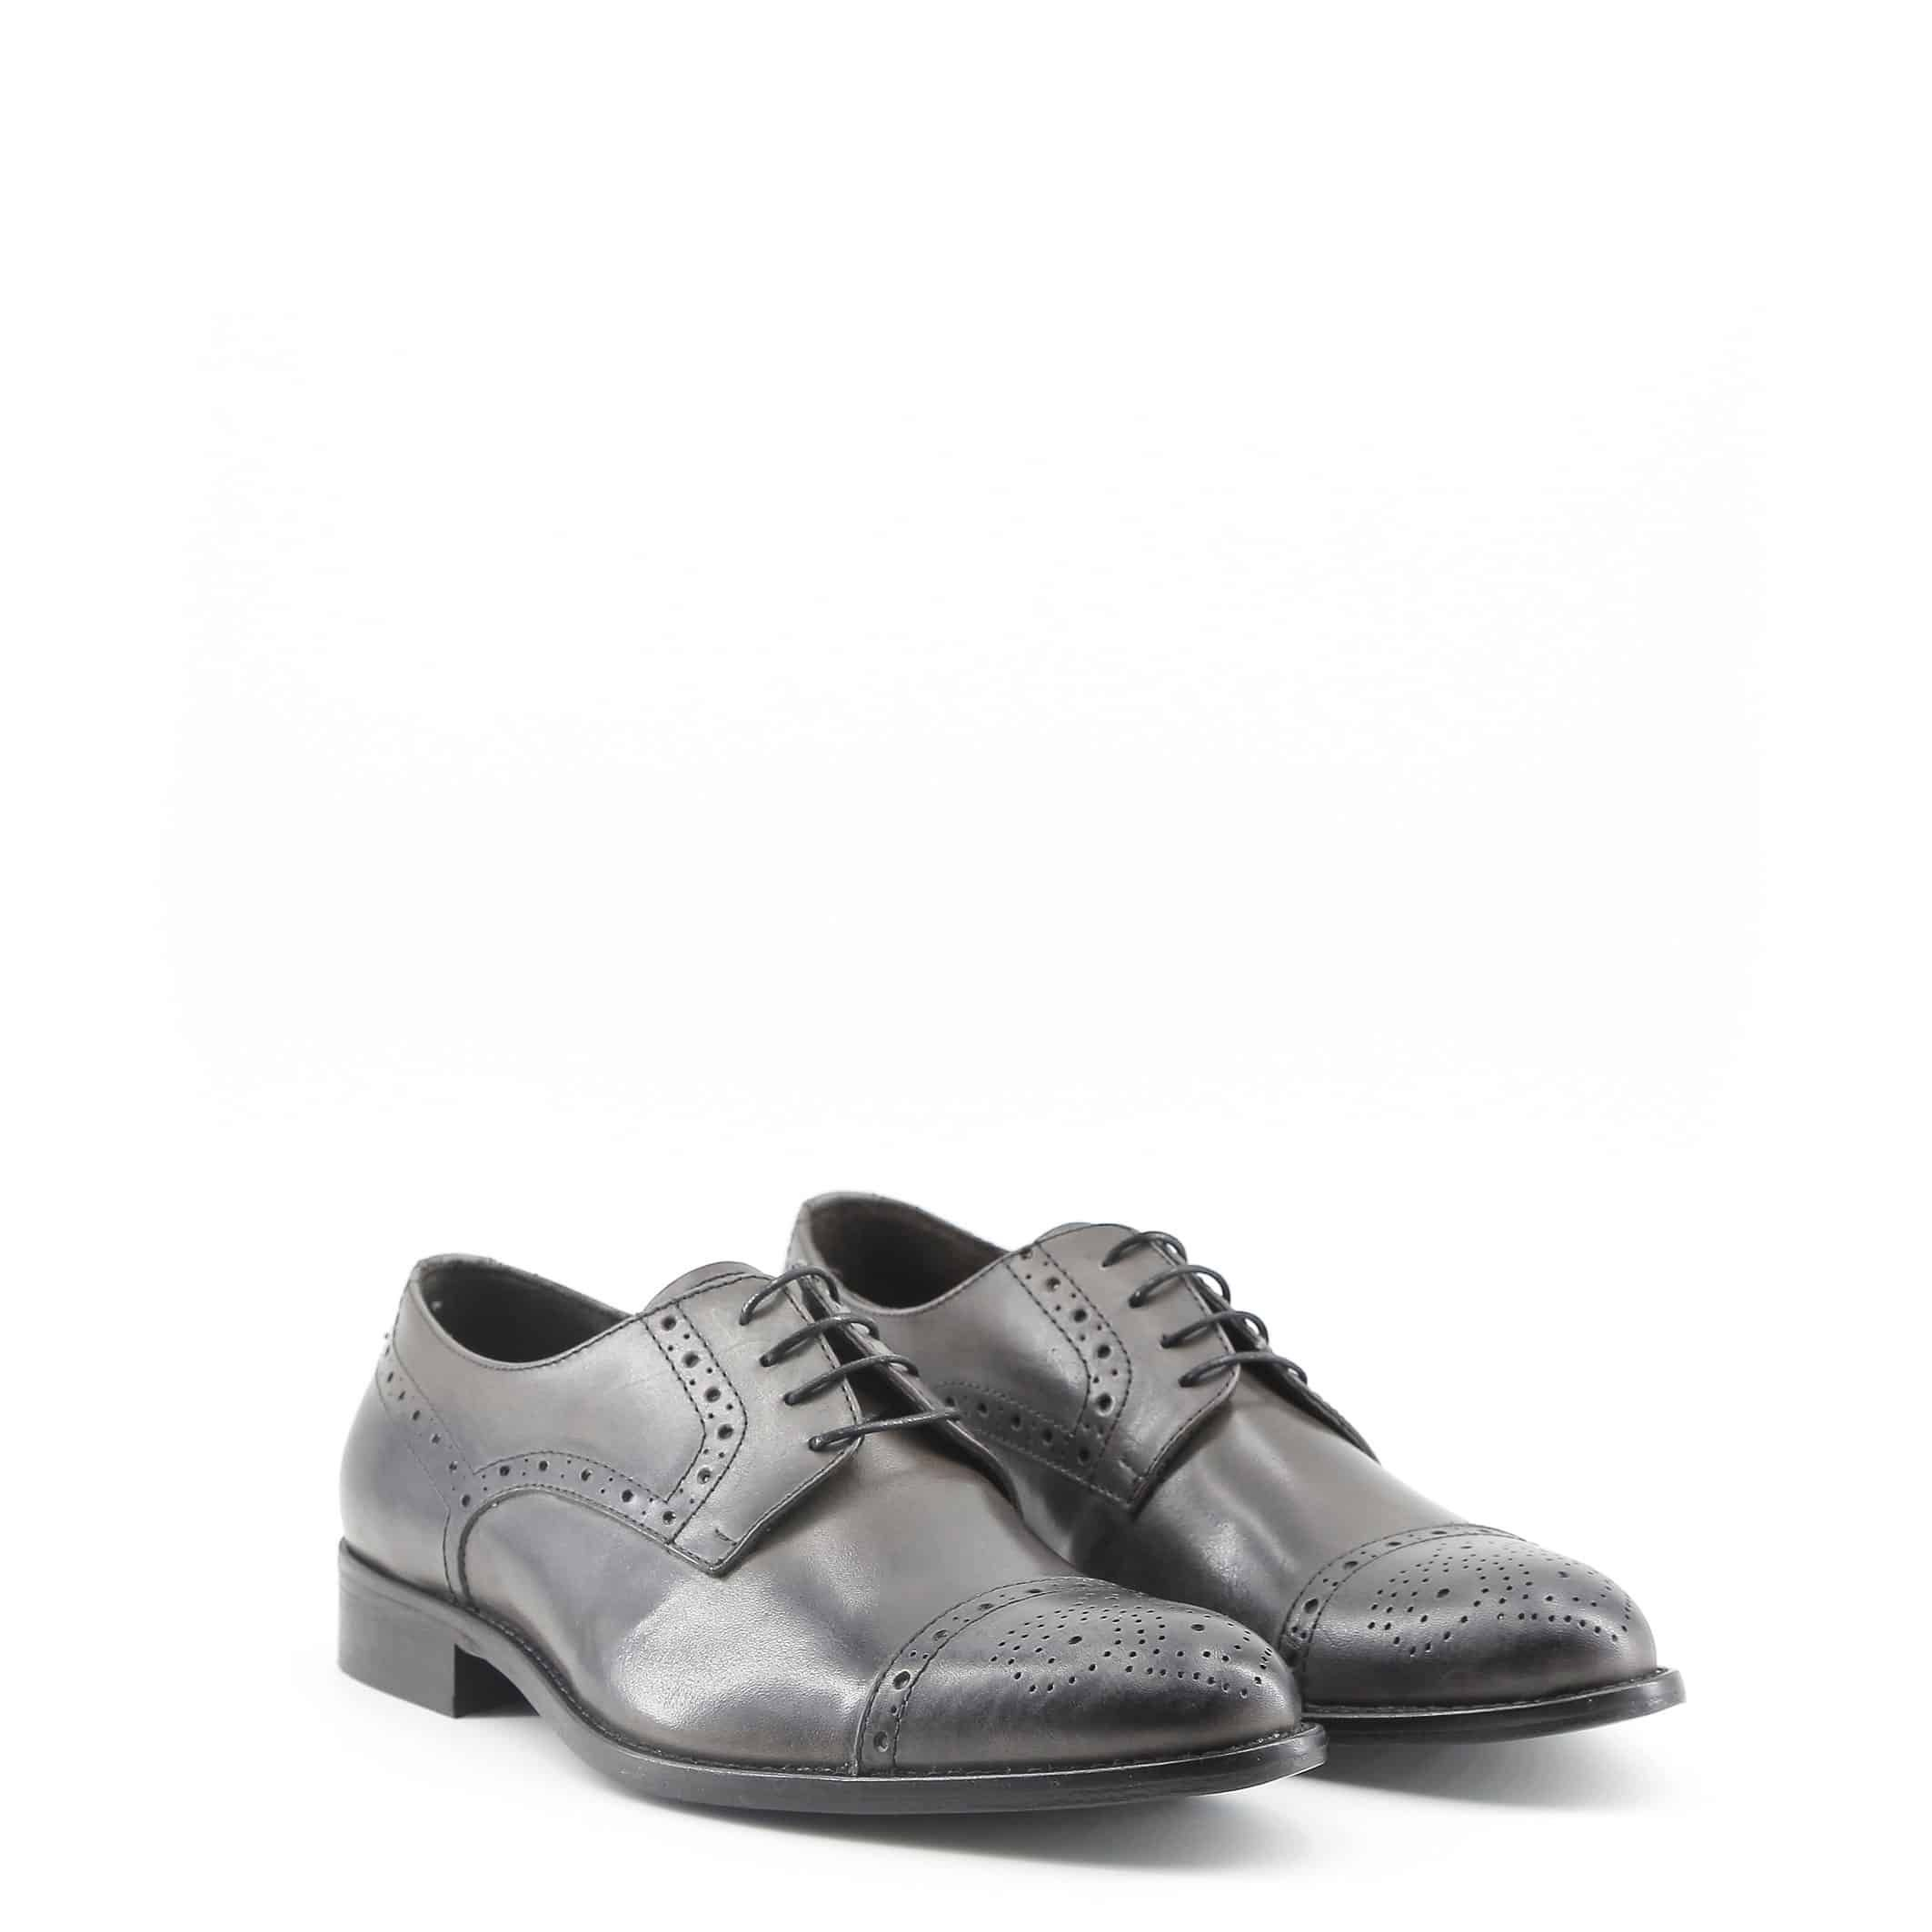 Chaussures à lacets Made in Italia – GIORGIO